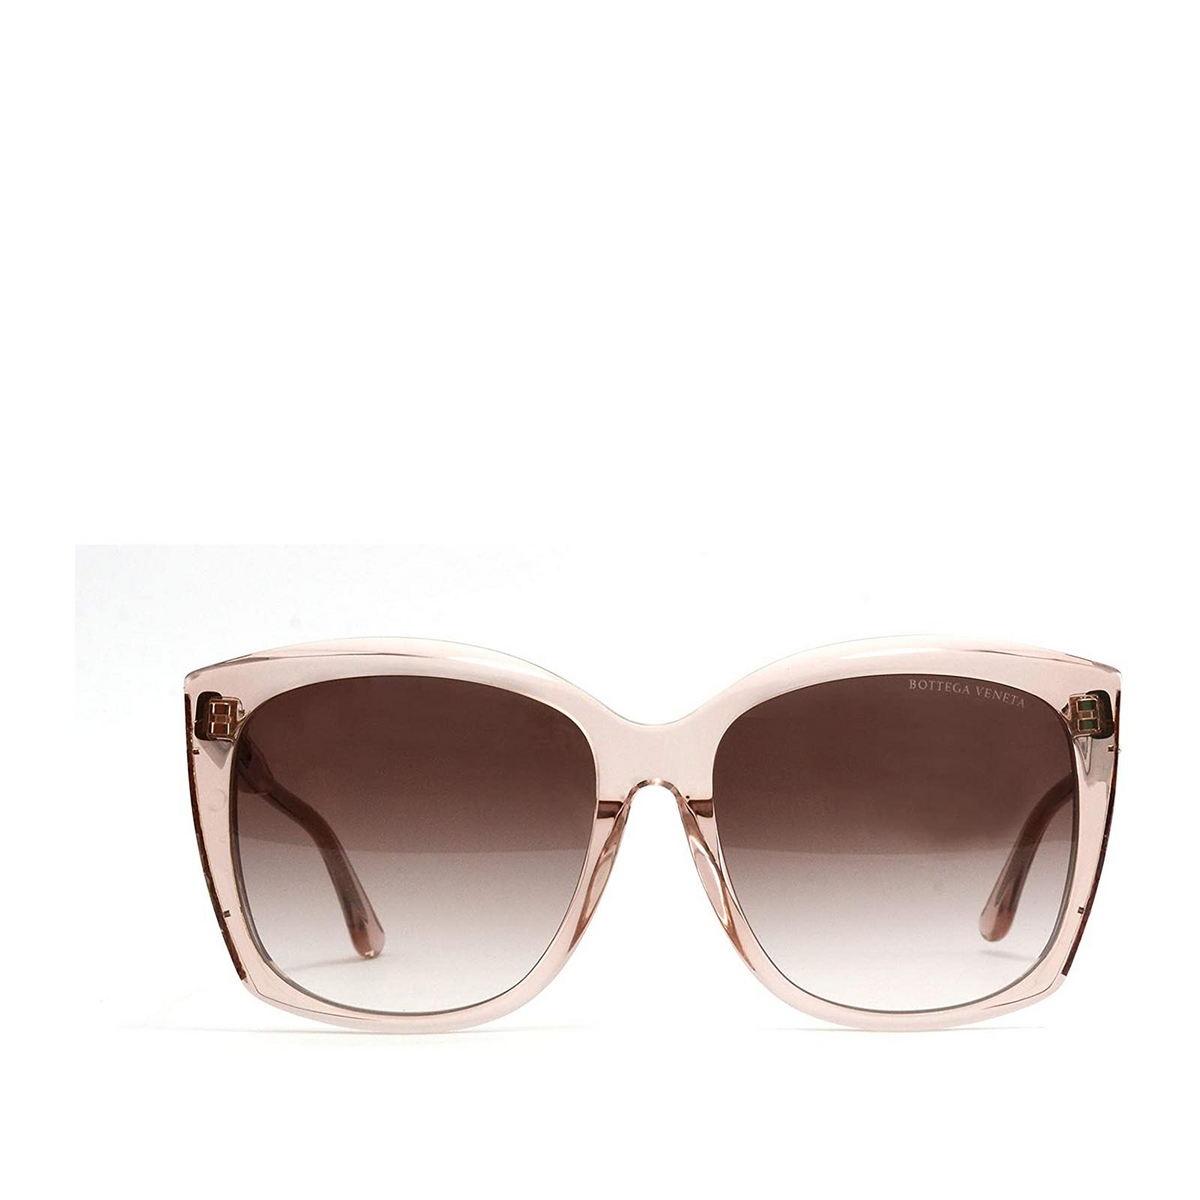 Bottega Veneta® Square Sunglasses: BV0182S color Transparent Pink 004 - front view.